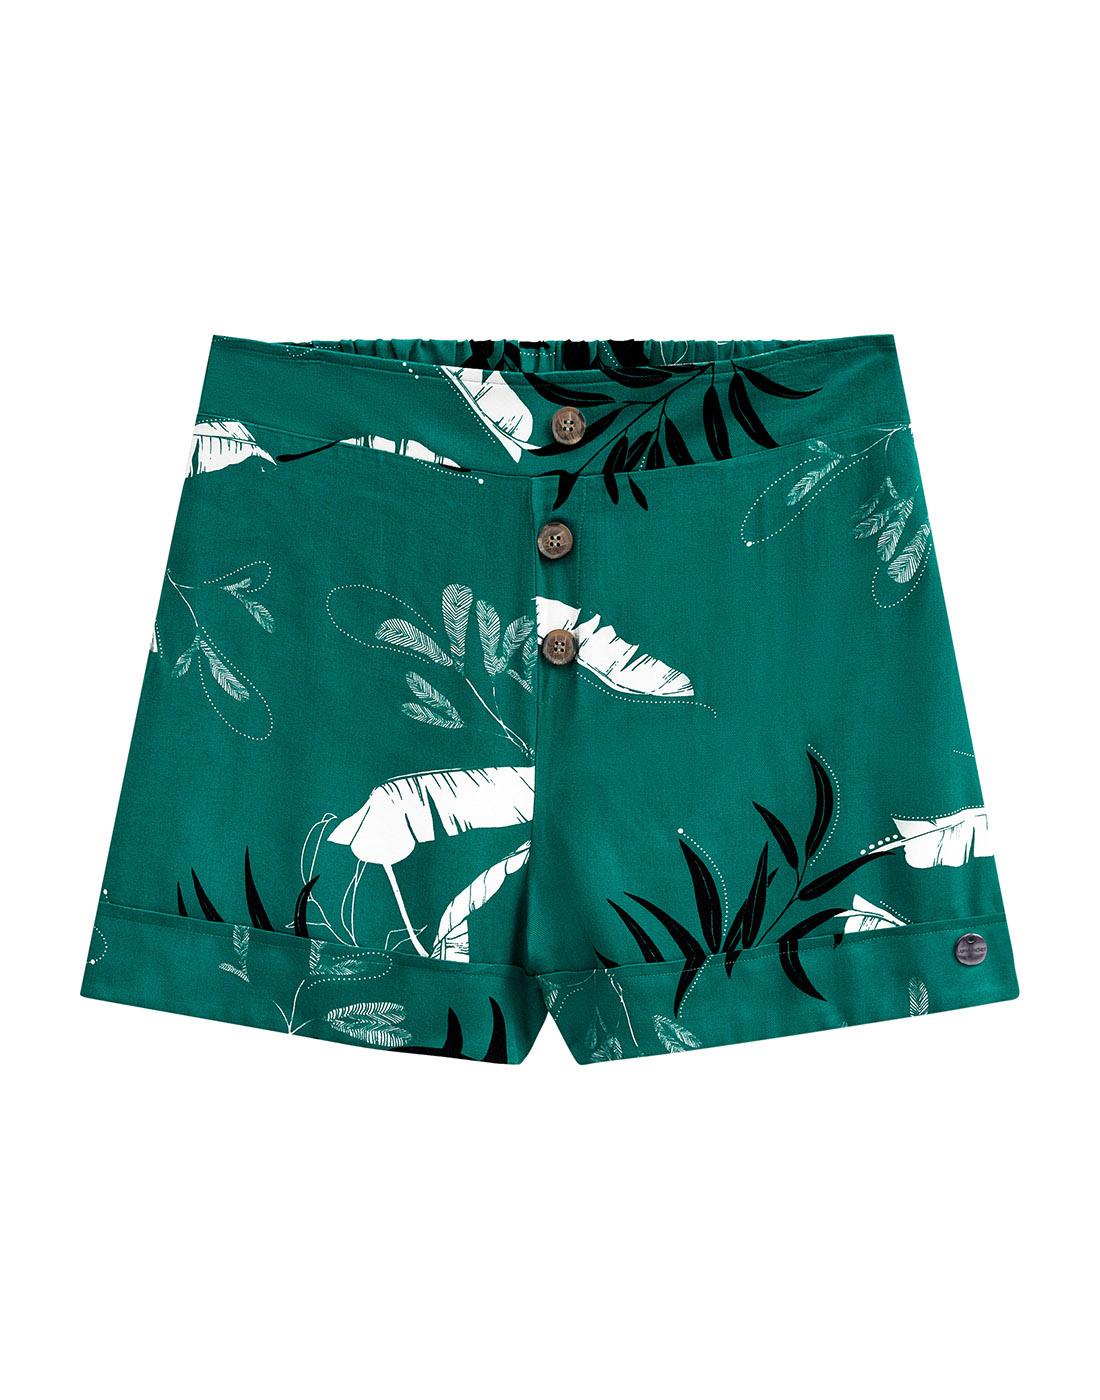 Bermuda Tecido Rayon Twill Verde Provence Lunender Mais Mulher